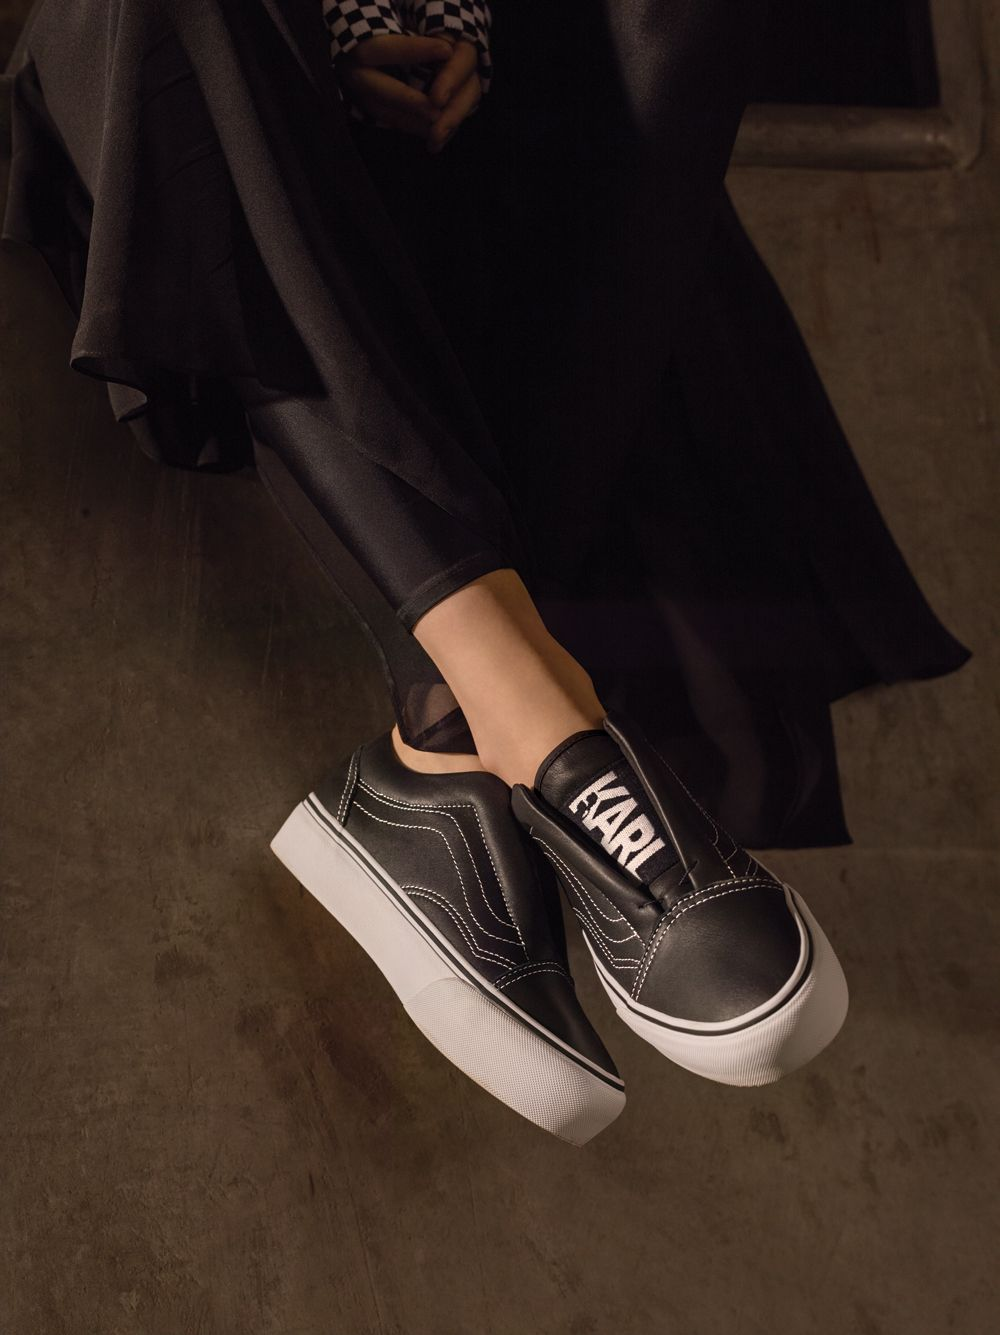 Karl Lagerfeld Designs Vans Sneakers for Women - EU Kicks  Sneaker Magazine ac5e84db2